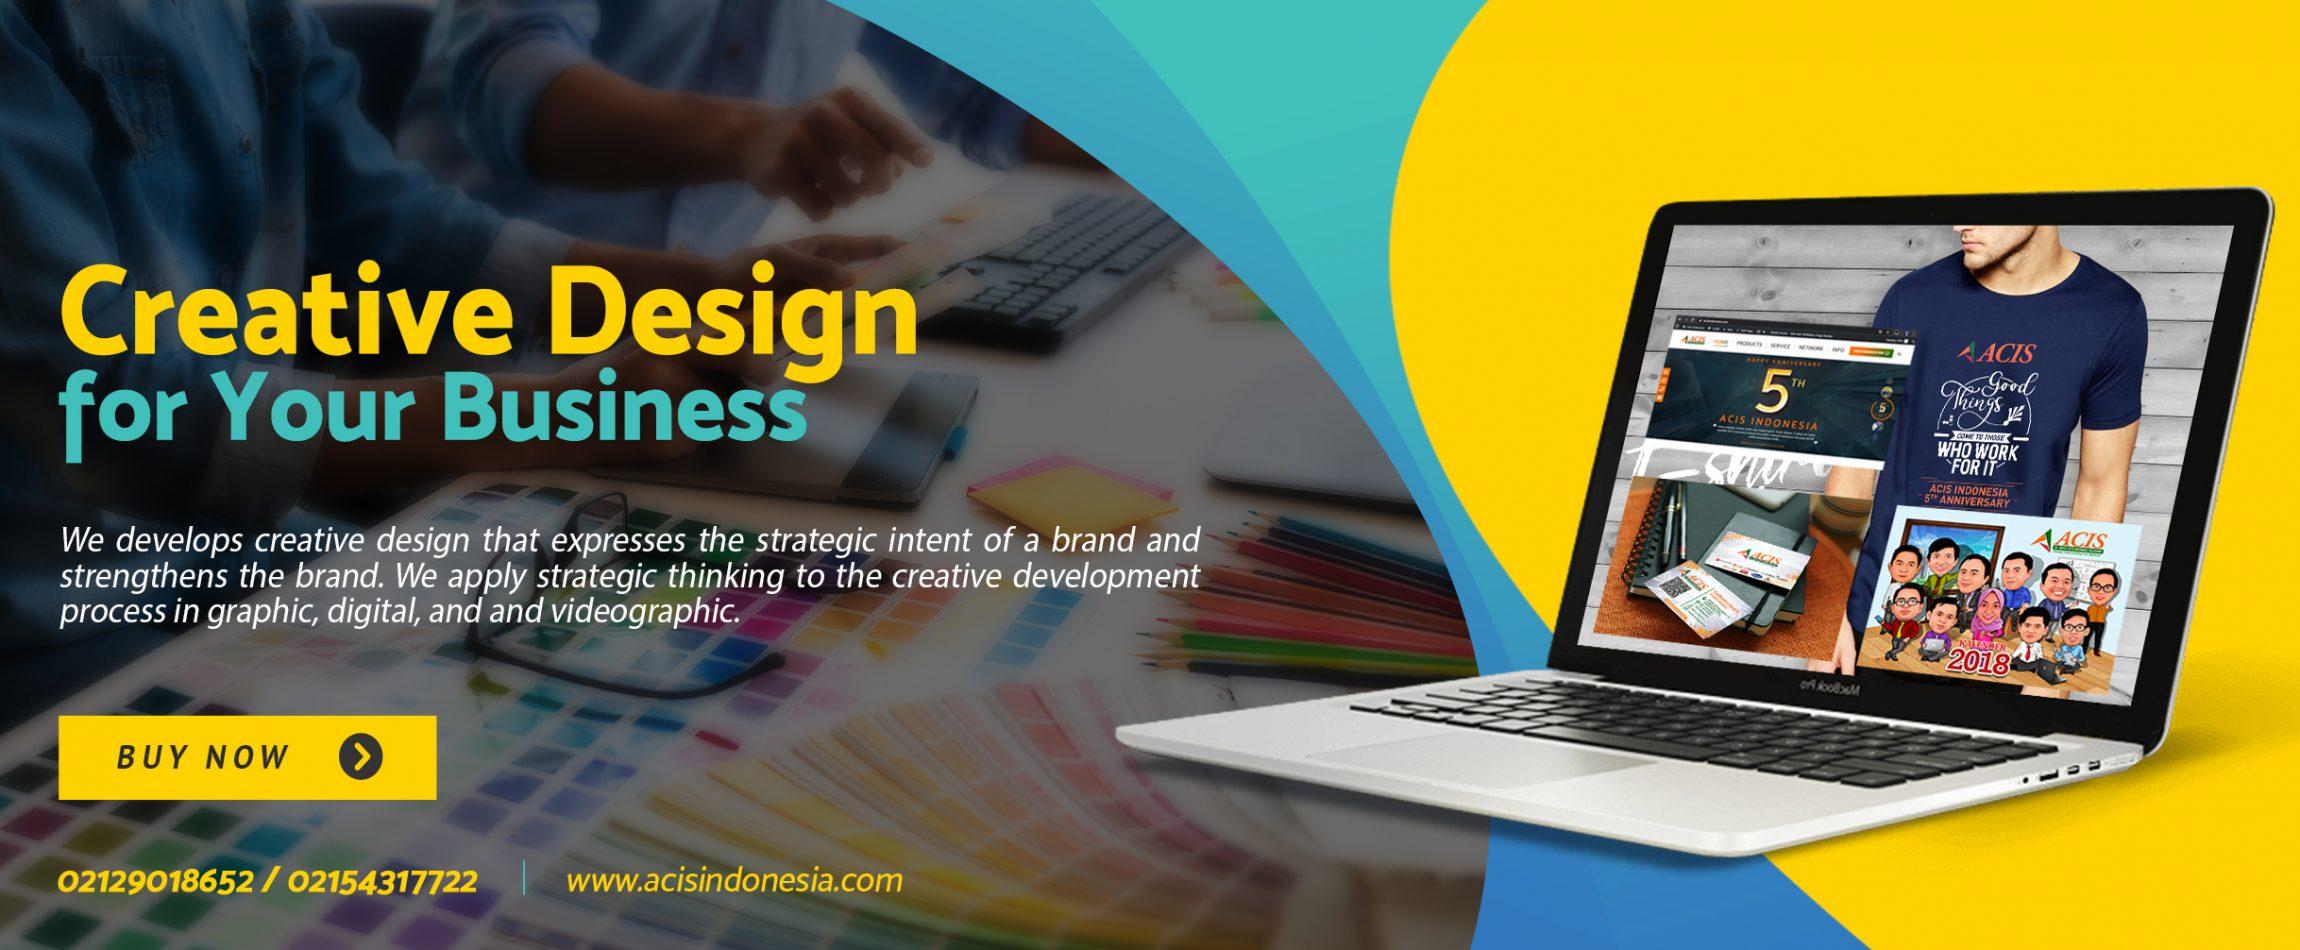 Paket-Design-ACIS-web